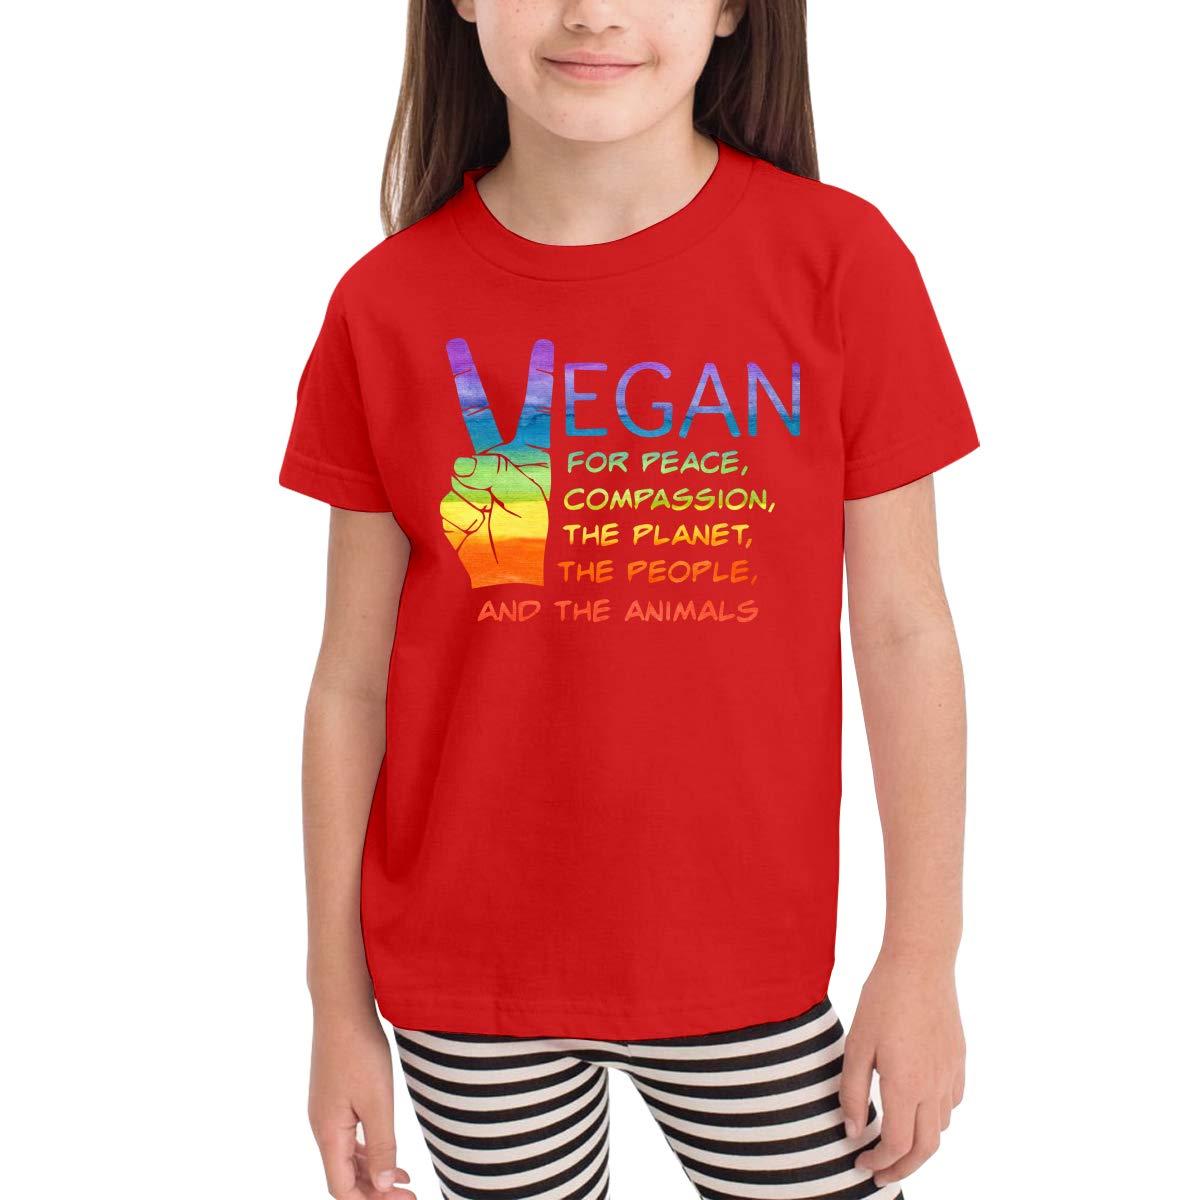 Sally Vegan Unisex Youths Short Sleeve T-Shirt Kids T-Shirt Tops Black